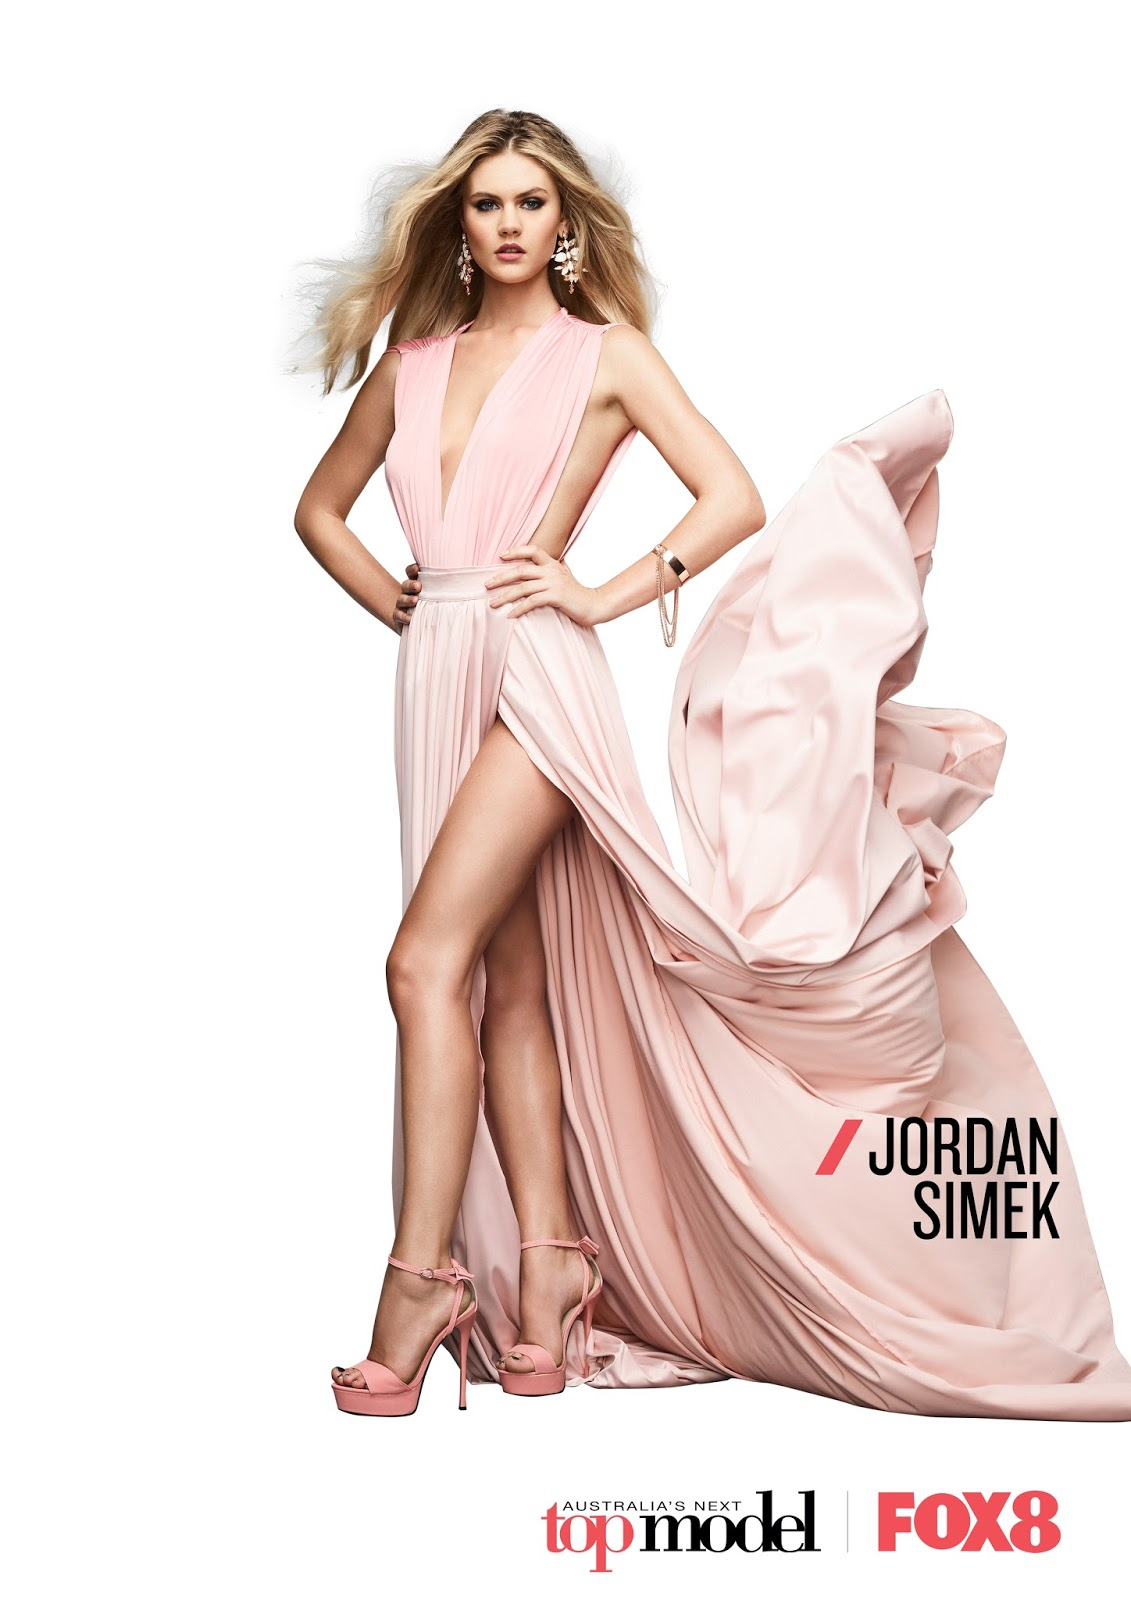 new styles the cheapest aliexpress All Next Top Model: Portafolio de Jordan Simek